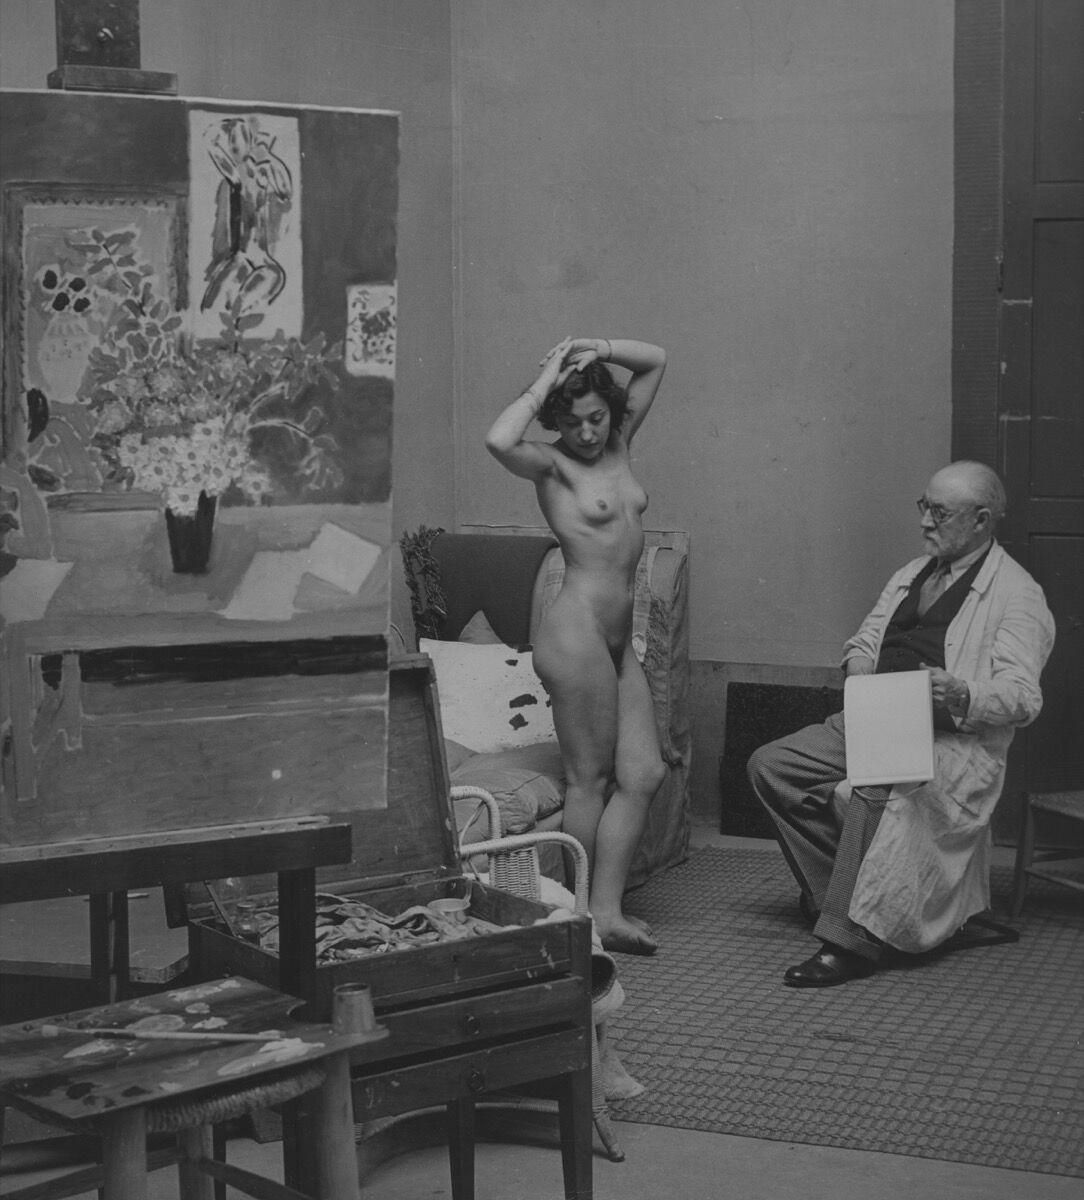 Brassaï, Henri Matisse with Nude, Paris 1939. © Galerie Johannes Faber. Courtesy of Galerie Johannes Faber.